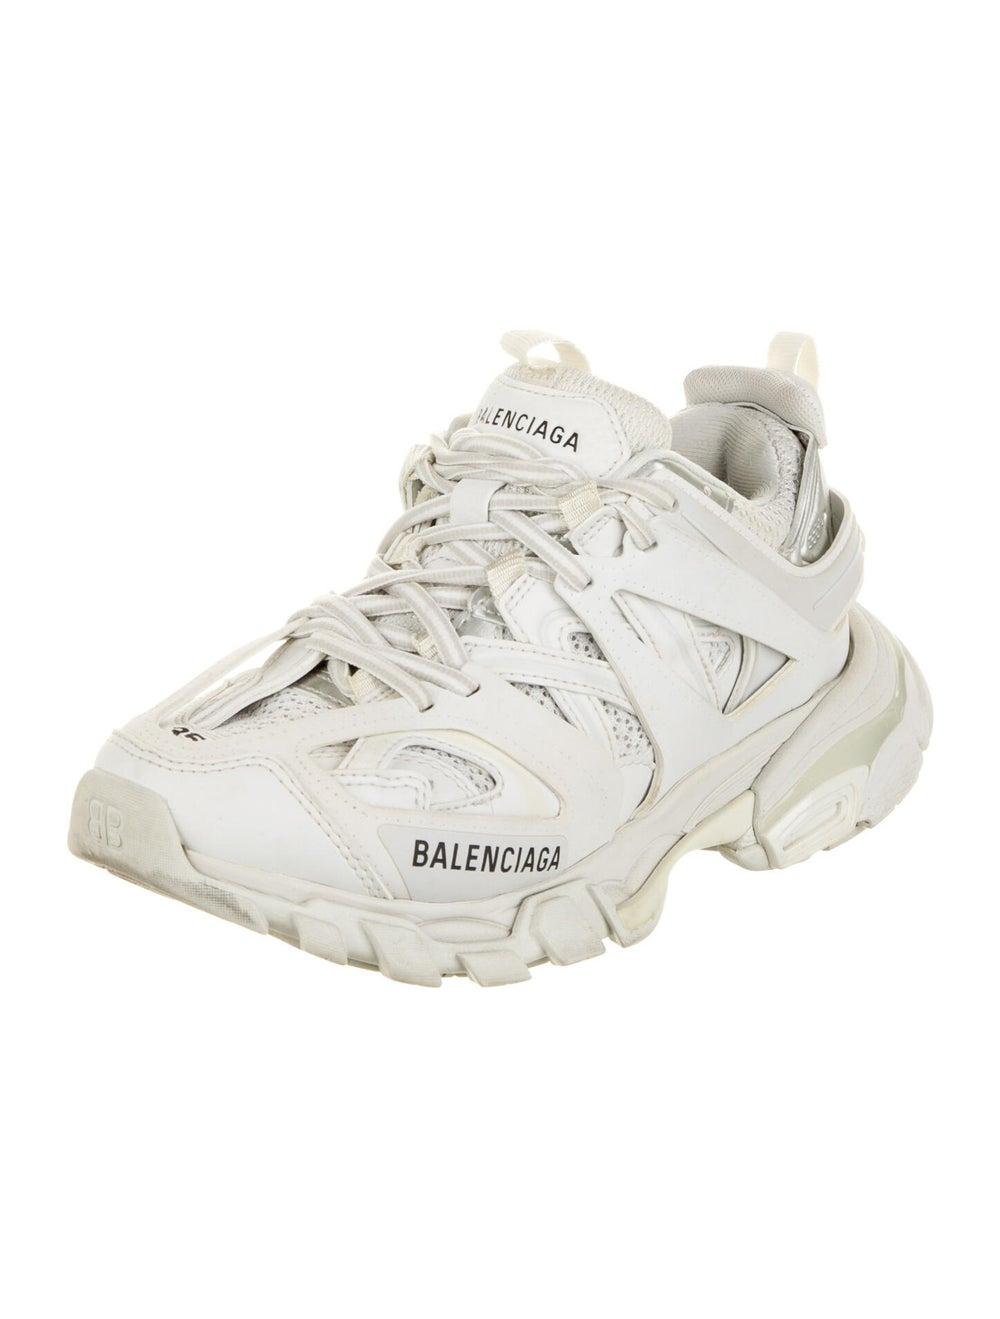 Balenciaga Track Trainer Sneakers White - image 2